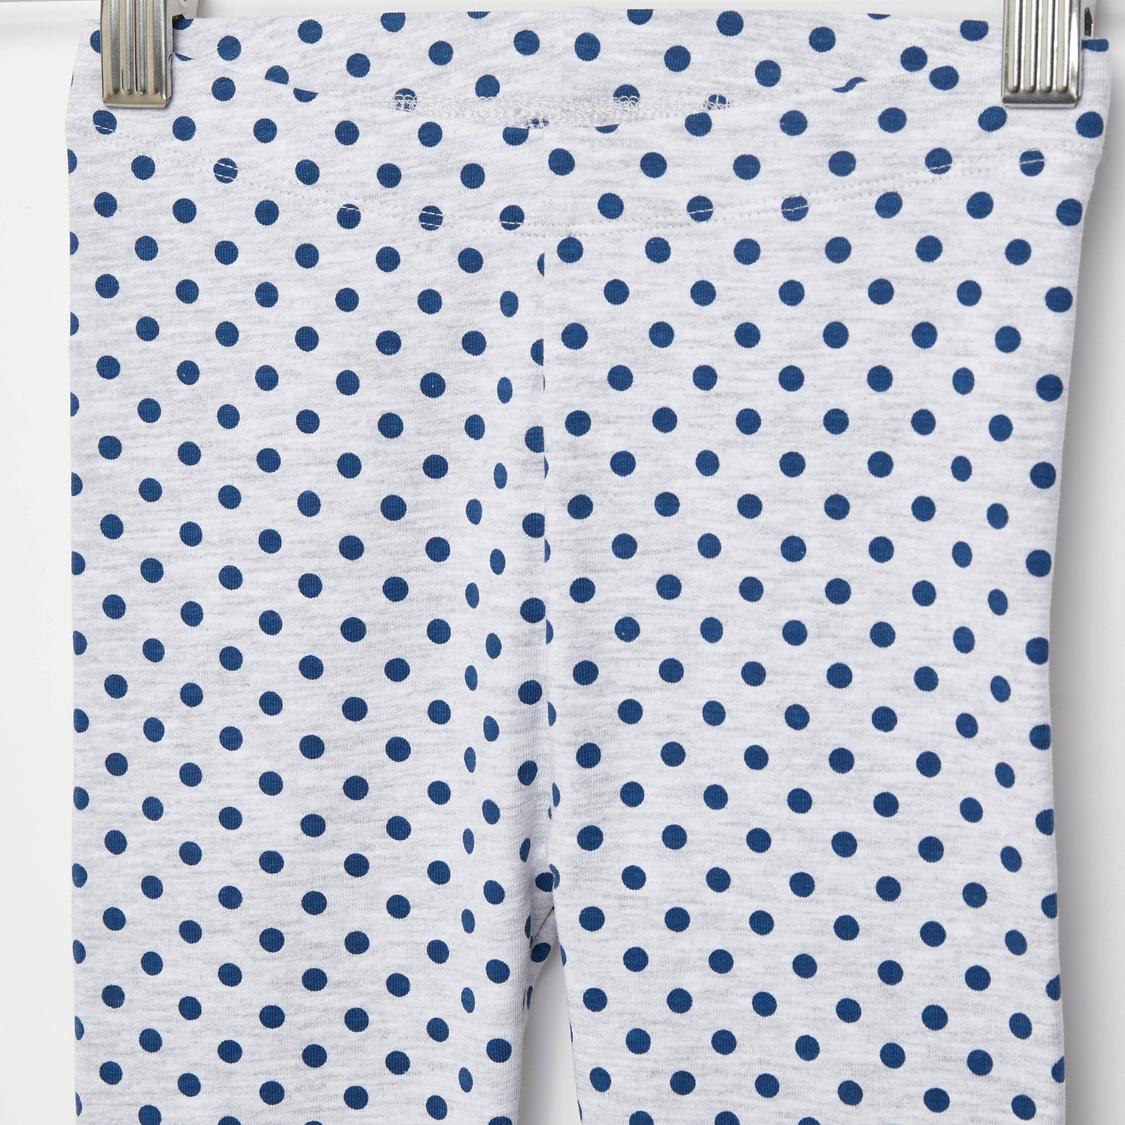 Full Length Polka Dots Print Leggings with Elasticated Waistband